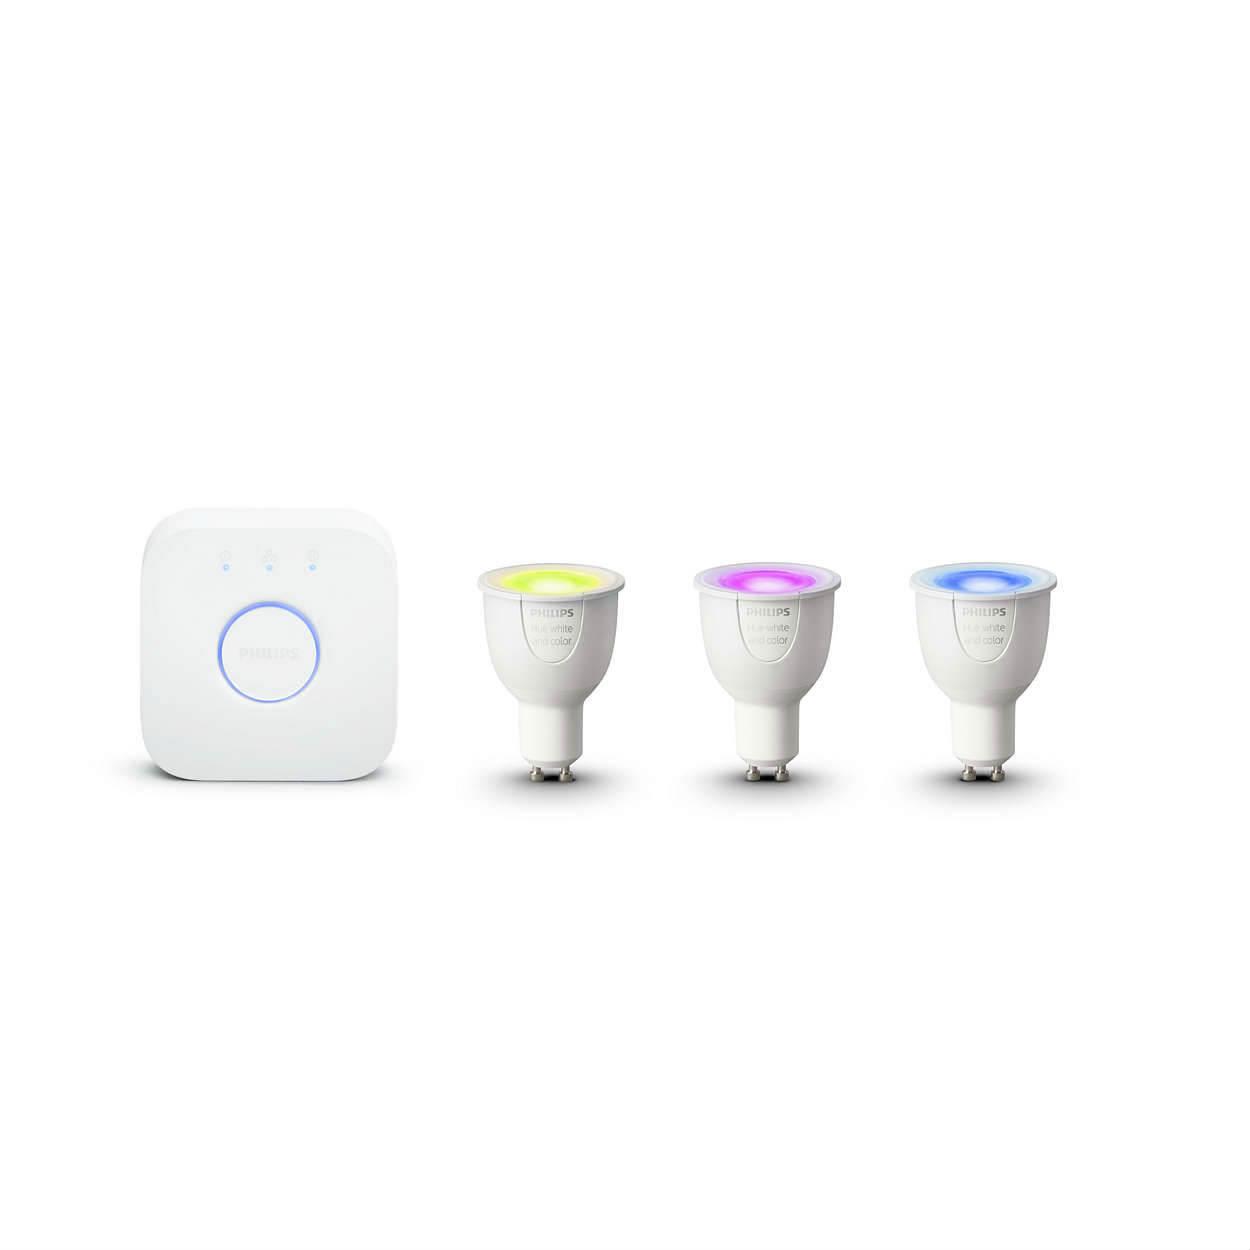 Philips Hue Home GU10 Starter Kits 3 x GU10 Bulb Bridge Included - система за безжично управляемо осветление за iOS и Android устройства